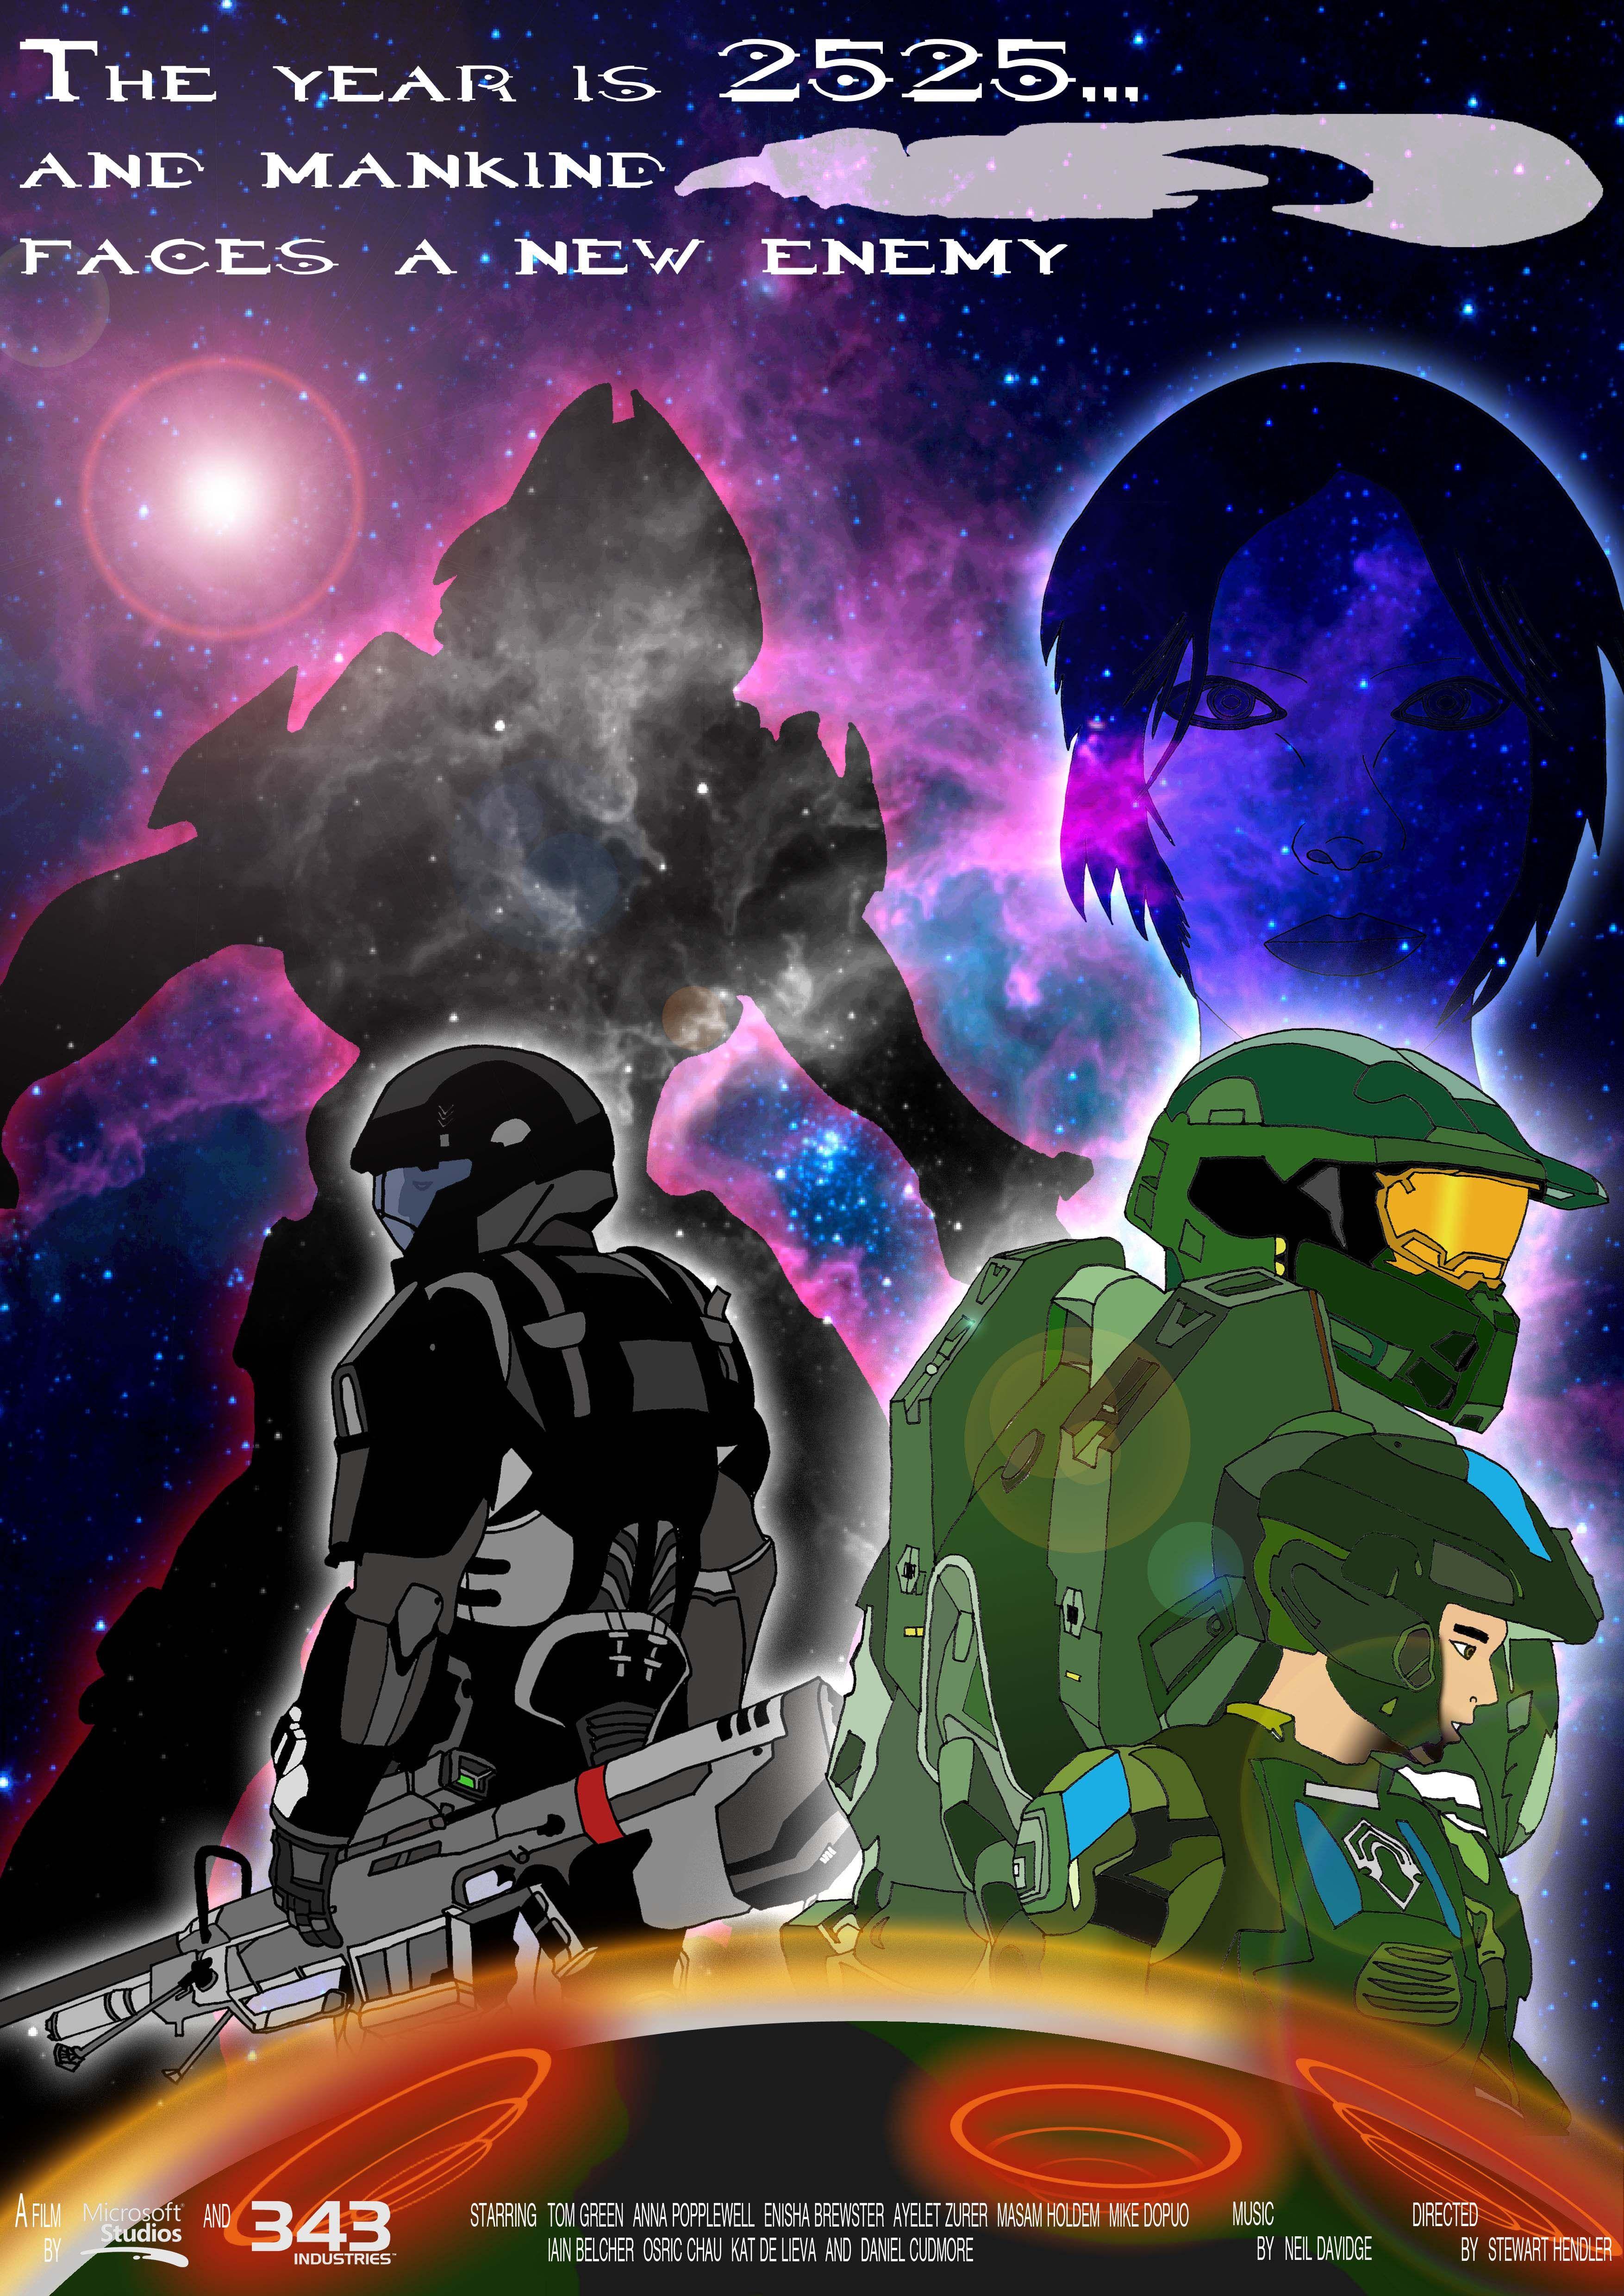 Halo: Forward Unto Dawn Poster (My final AS piece)